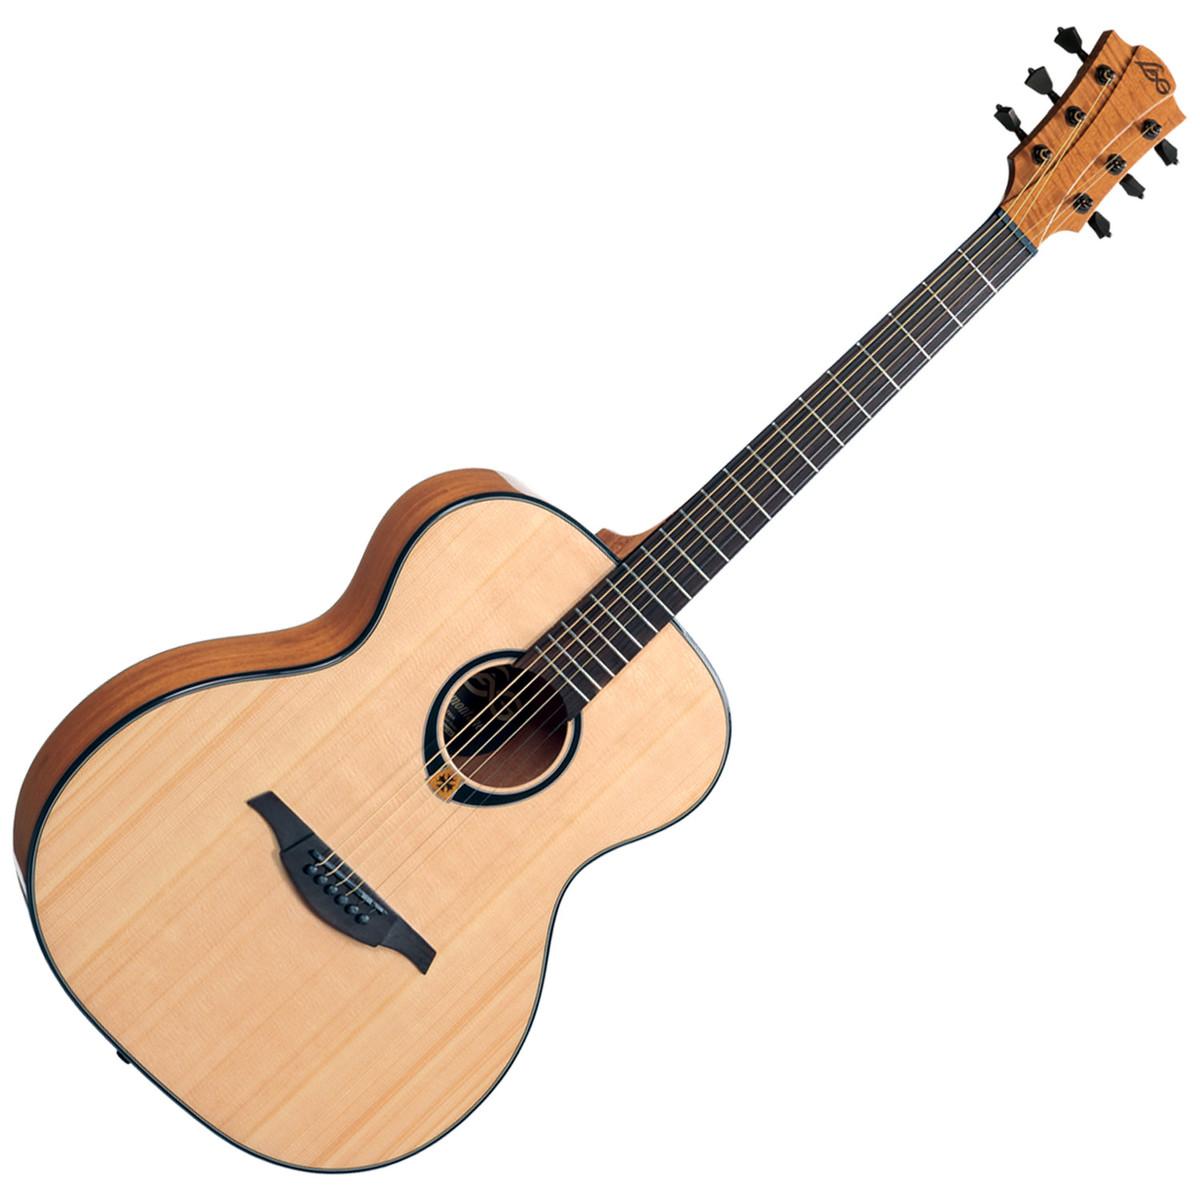 lag t80a auditorium acoustic guitar natural at. Black Bedroom Furniture Sets. Home Design Ideas